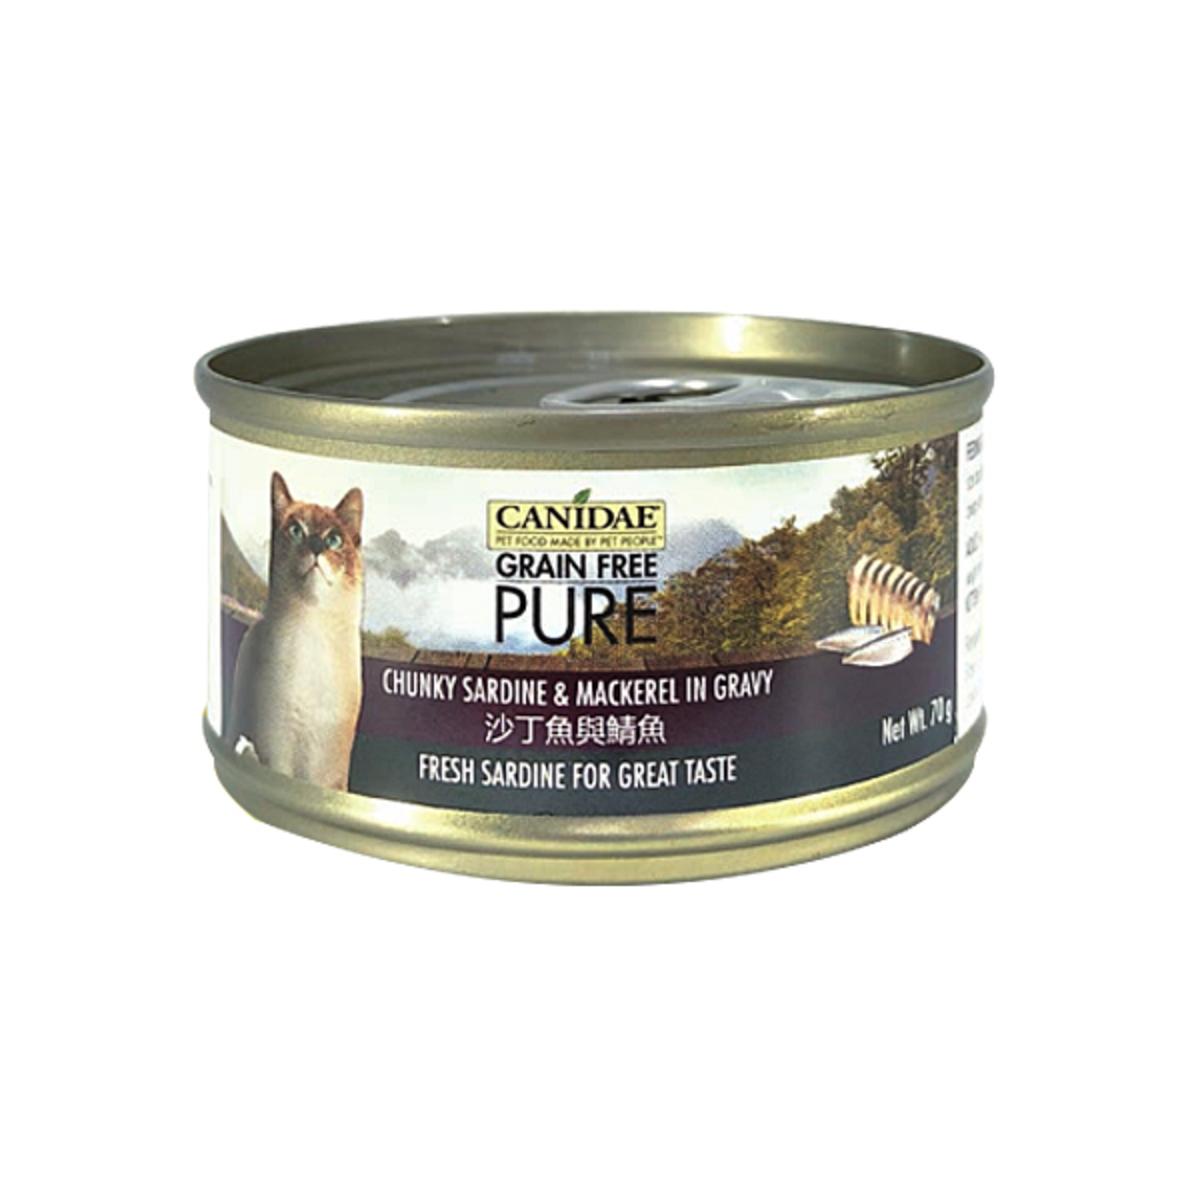 Chunky Sardine & Mackerel in gravy - 70g